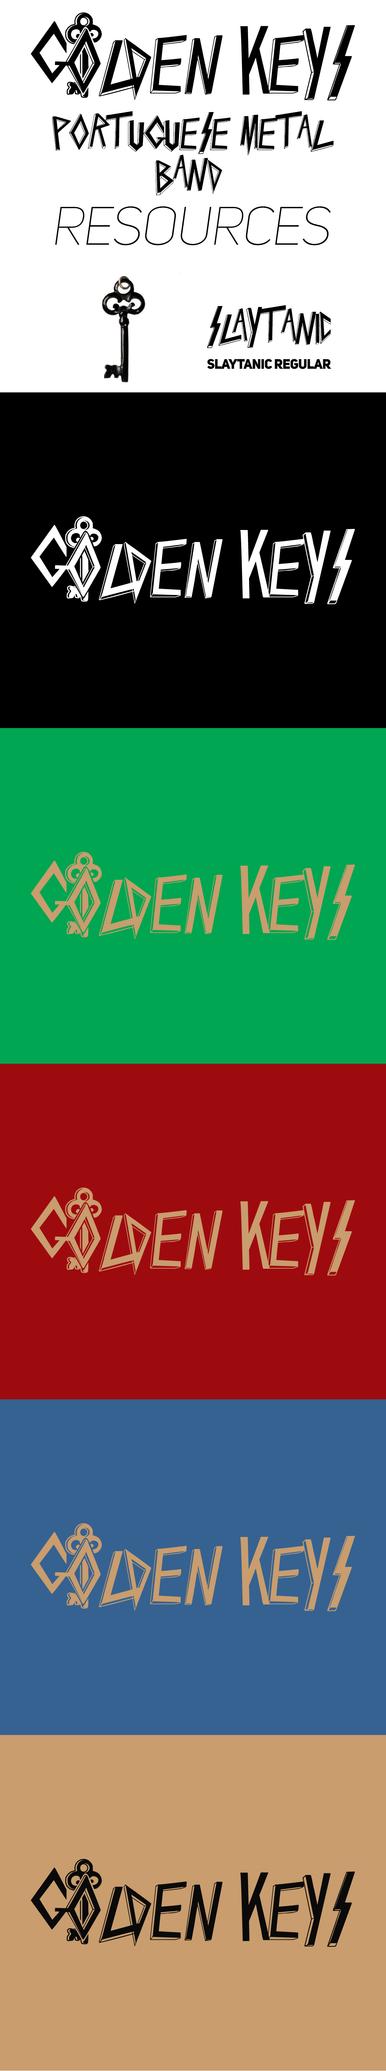 Golden Keys - logo by h3nrassc